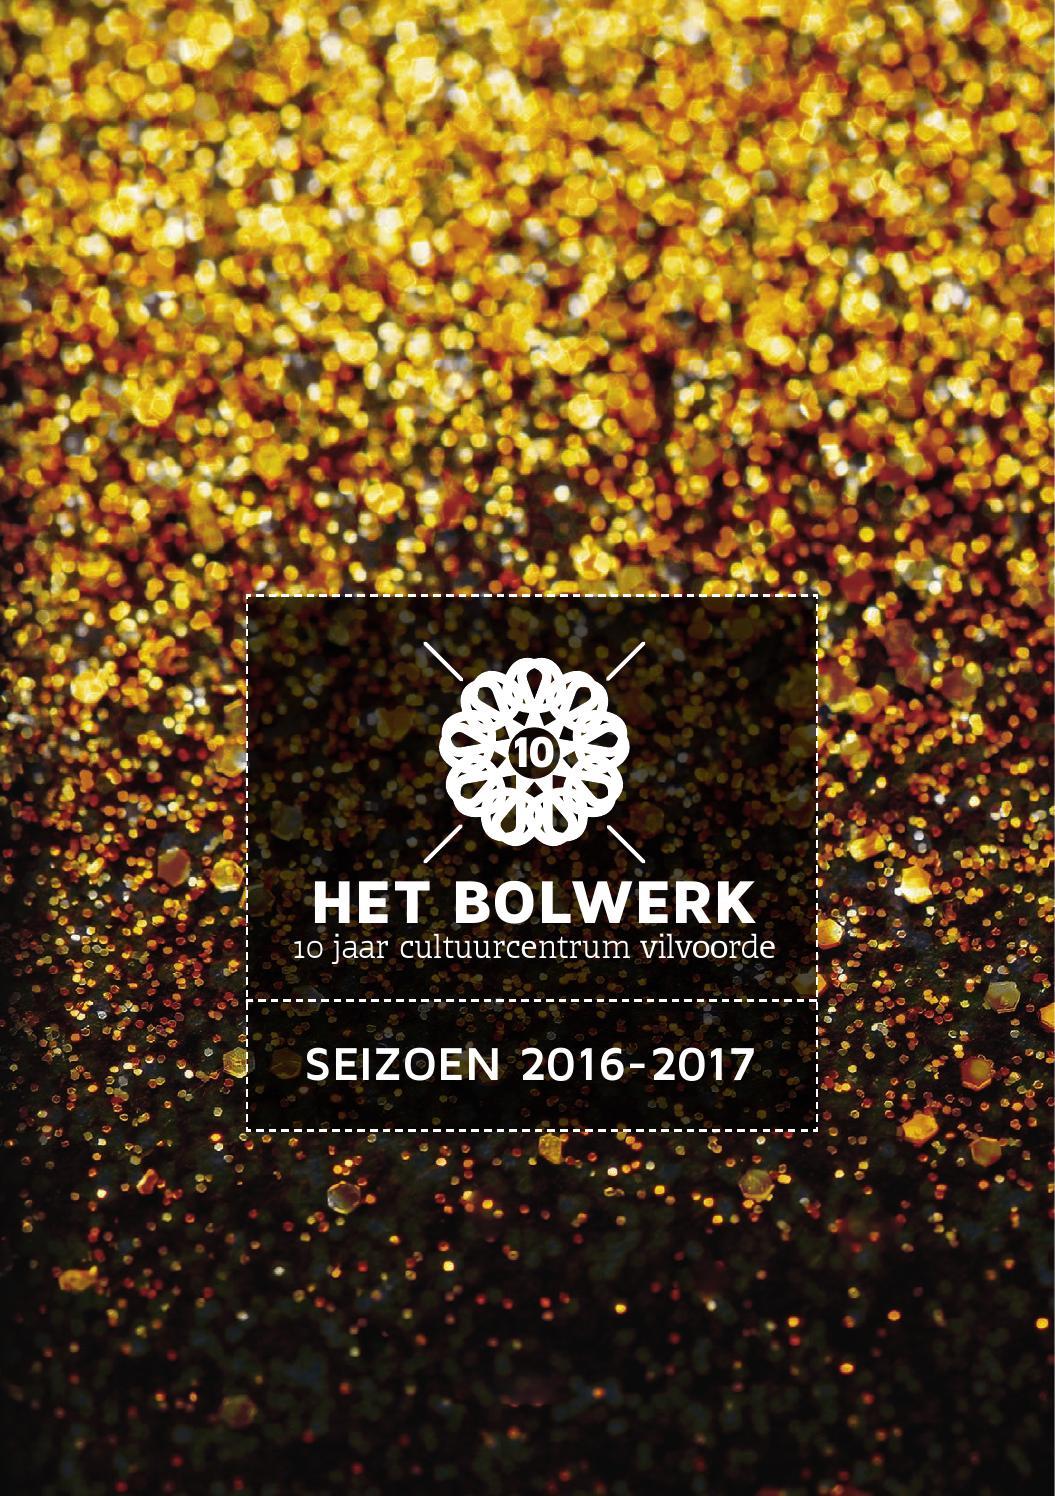 Cc het bolwerk seizoensbrochure 2014 2015 by cultuurcentrum het ...